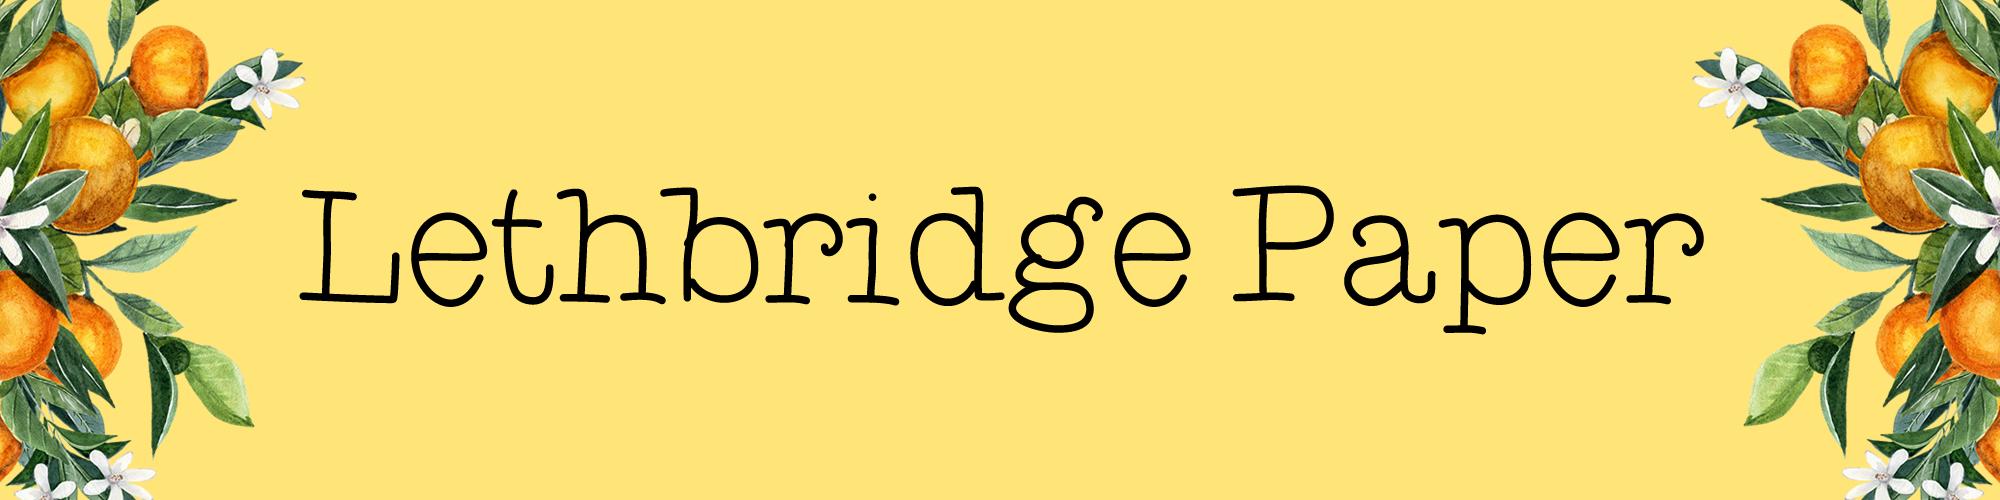 Lethbridge Paper